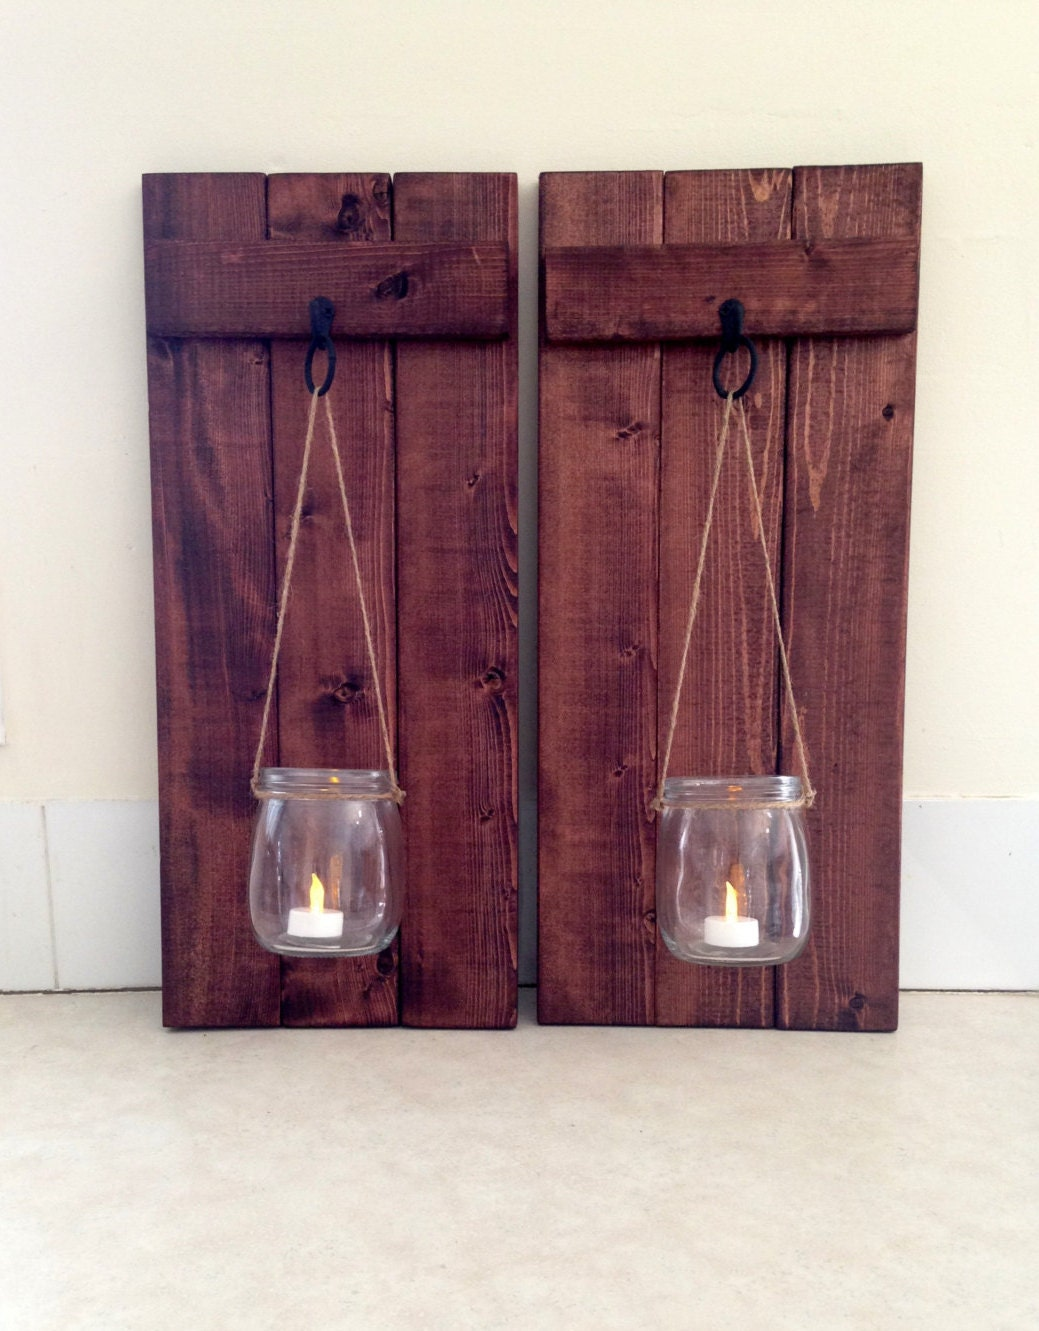 rustic wall decor wooden candle holder mason jar candle. Black Bedroom Furniture Sets. Home Design Ideas